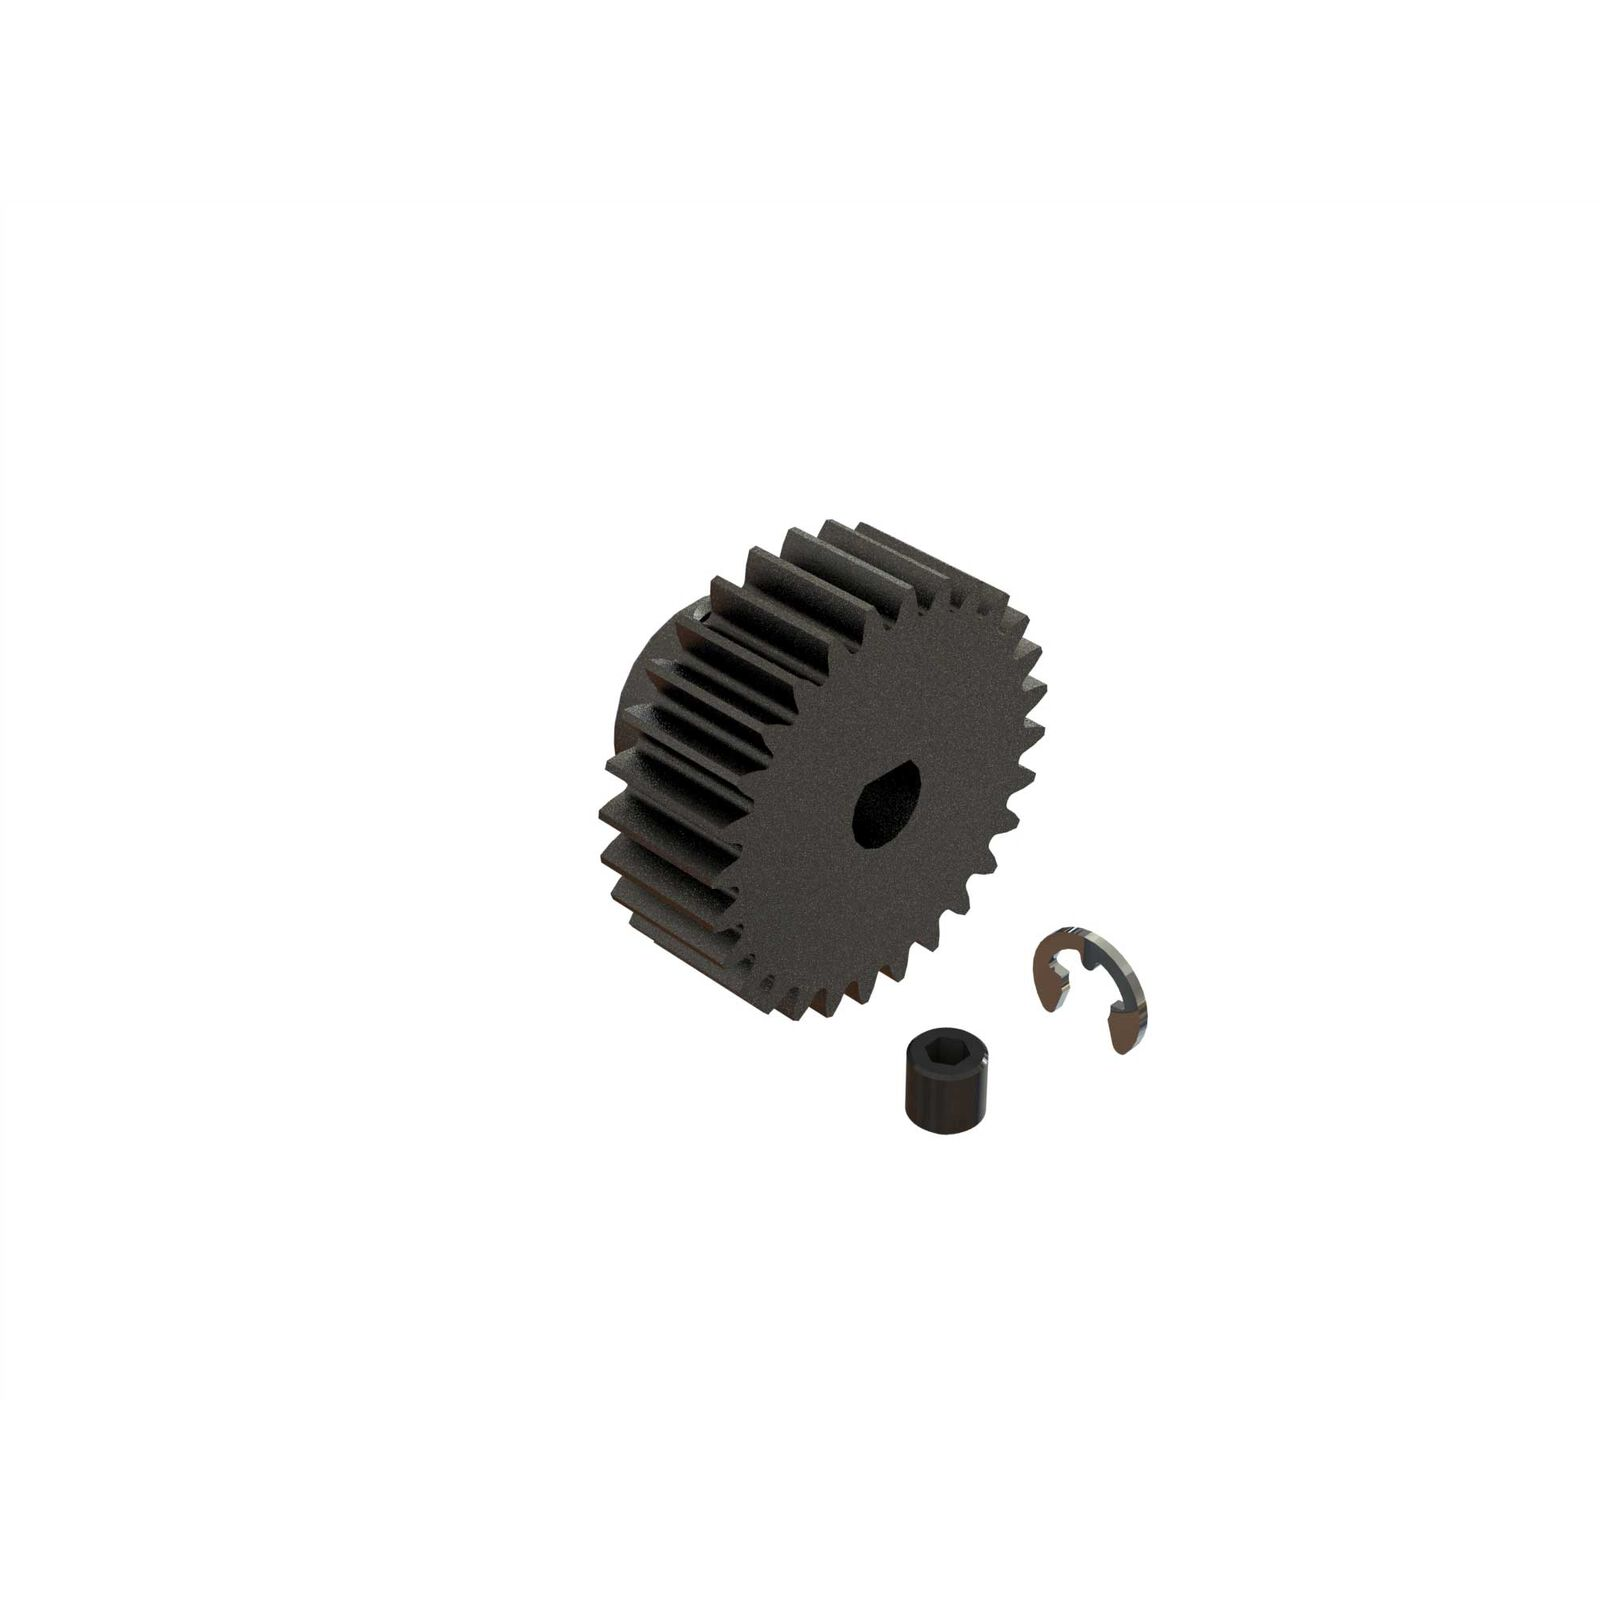 28T 0.8Mod Safe-D5 Pinion Gear